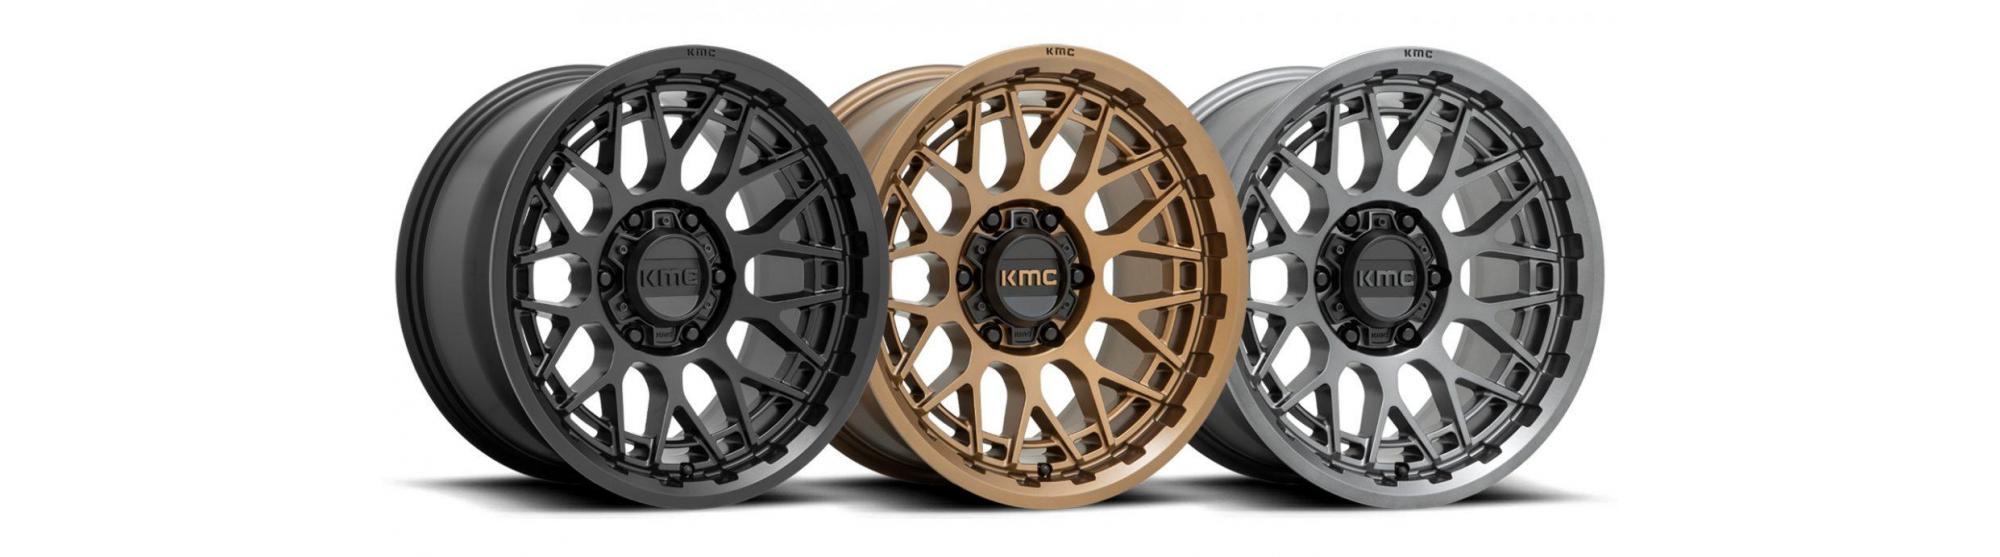 KM722 TECHNIC FROM KMC WHEELS